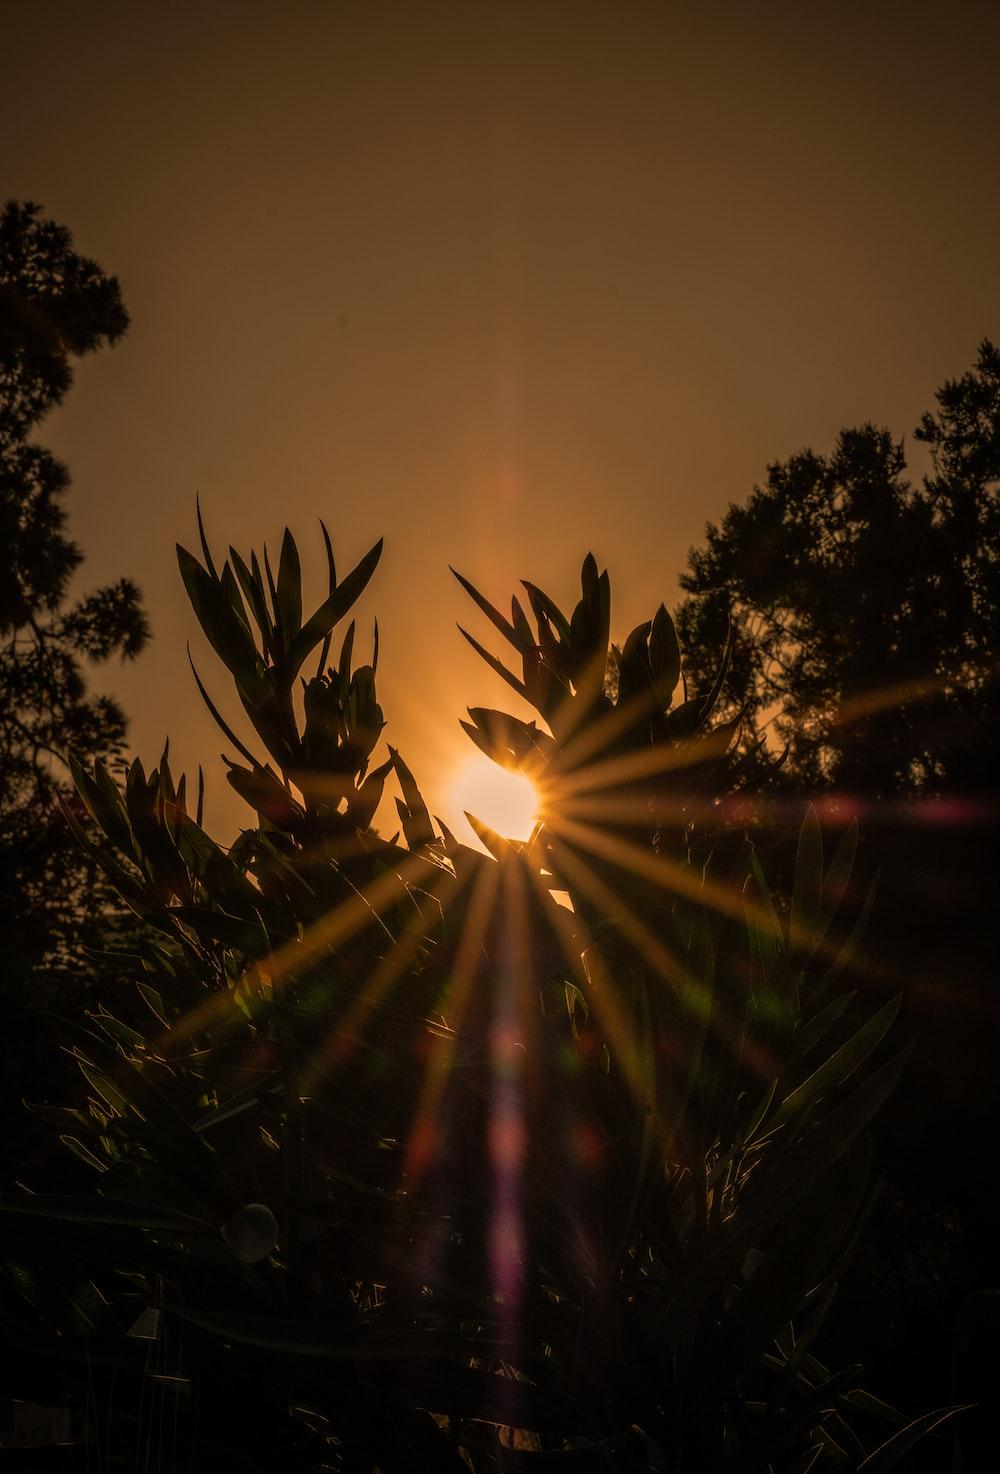 sun rays coming through green trees